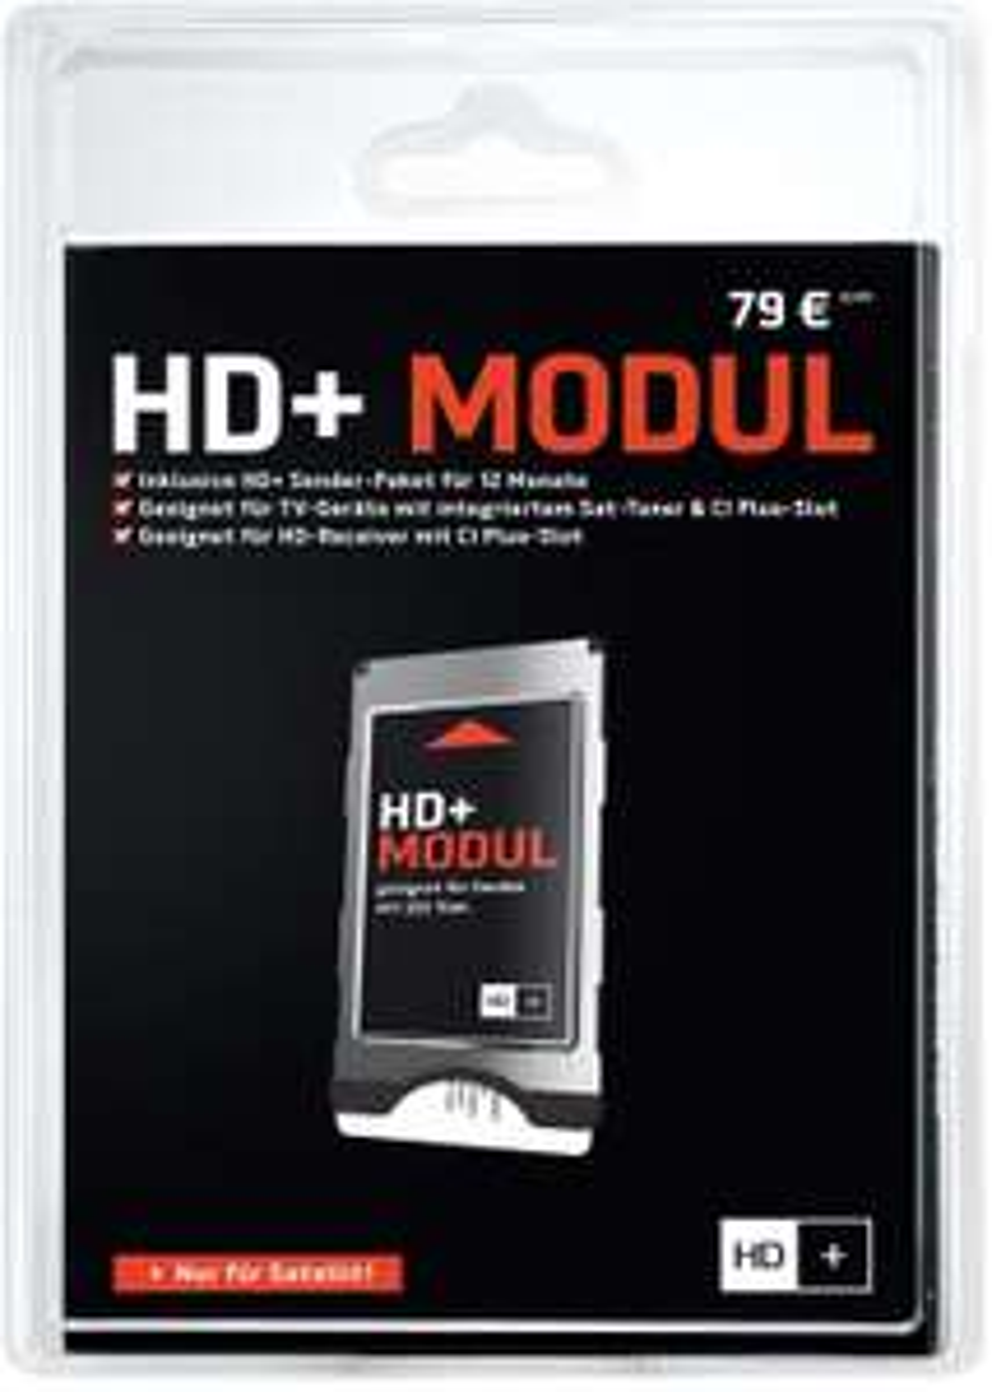 [AMAZON] HD+ Modul (HD Plus) + 12 Monate Karte für 59,90 EUR